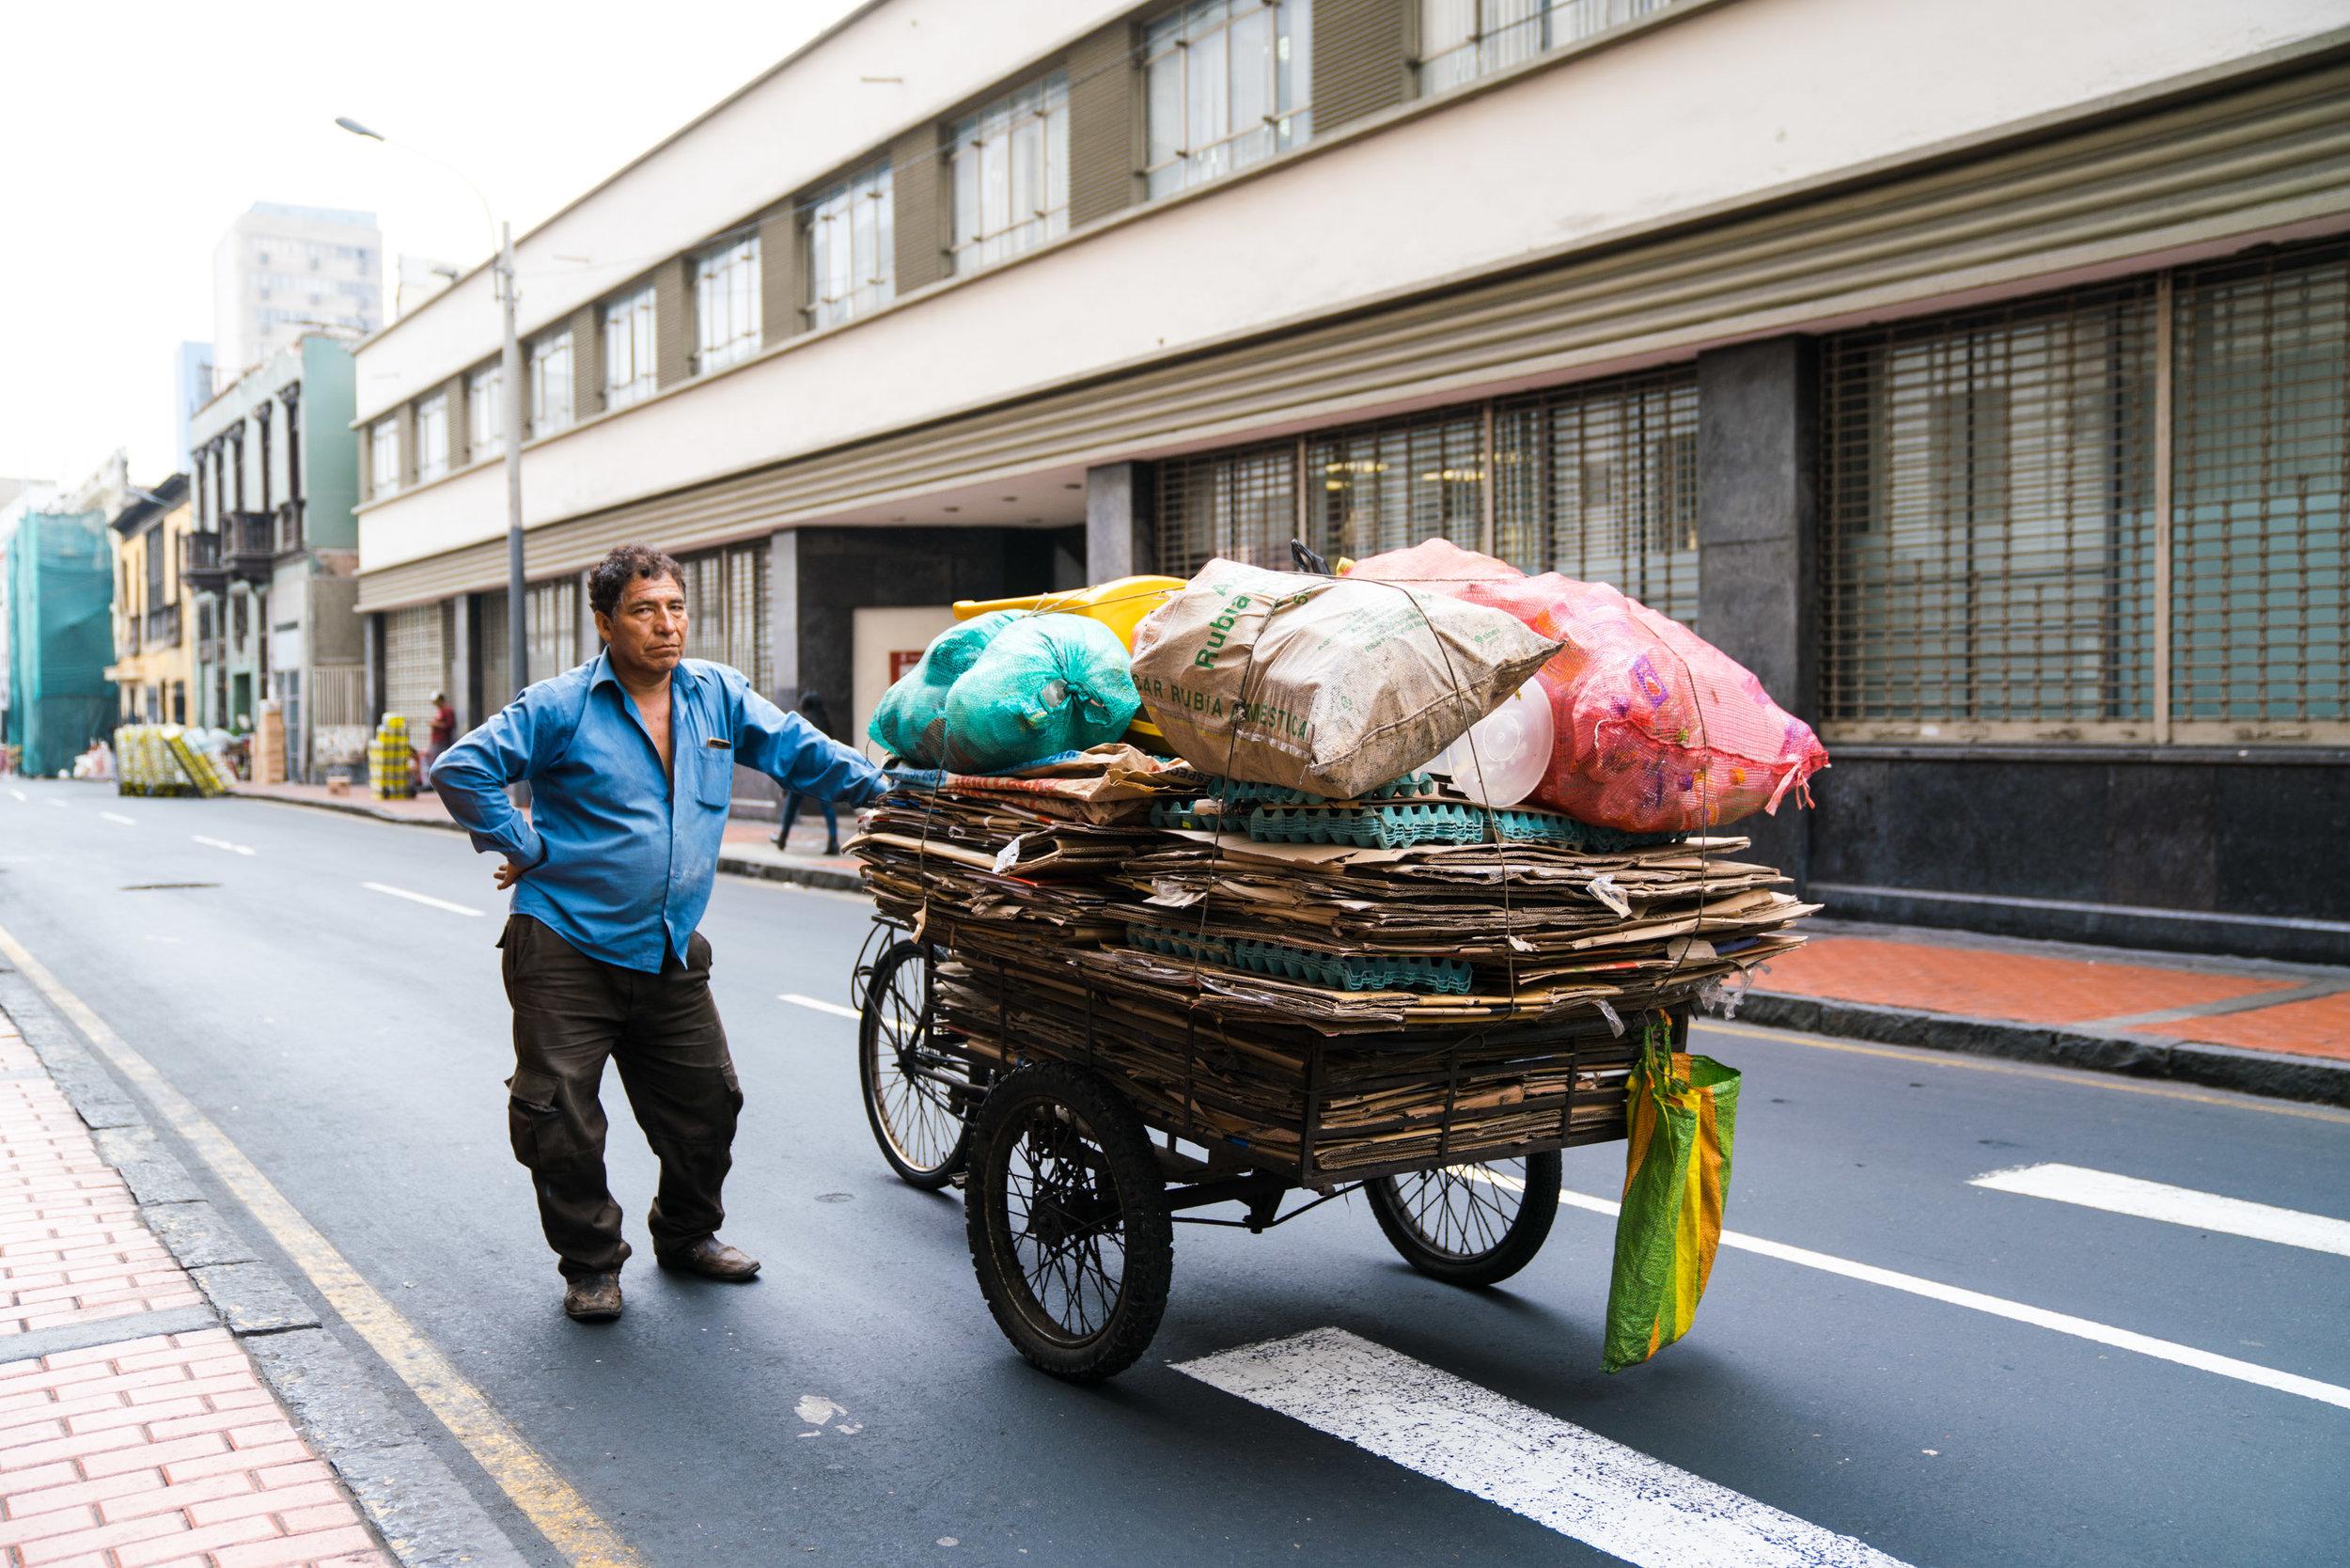 A Peruvian man transports recycling across the city. Lima, Peru. 2018